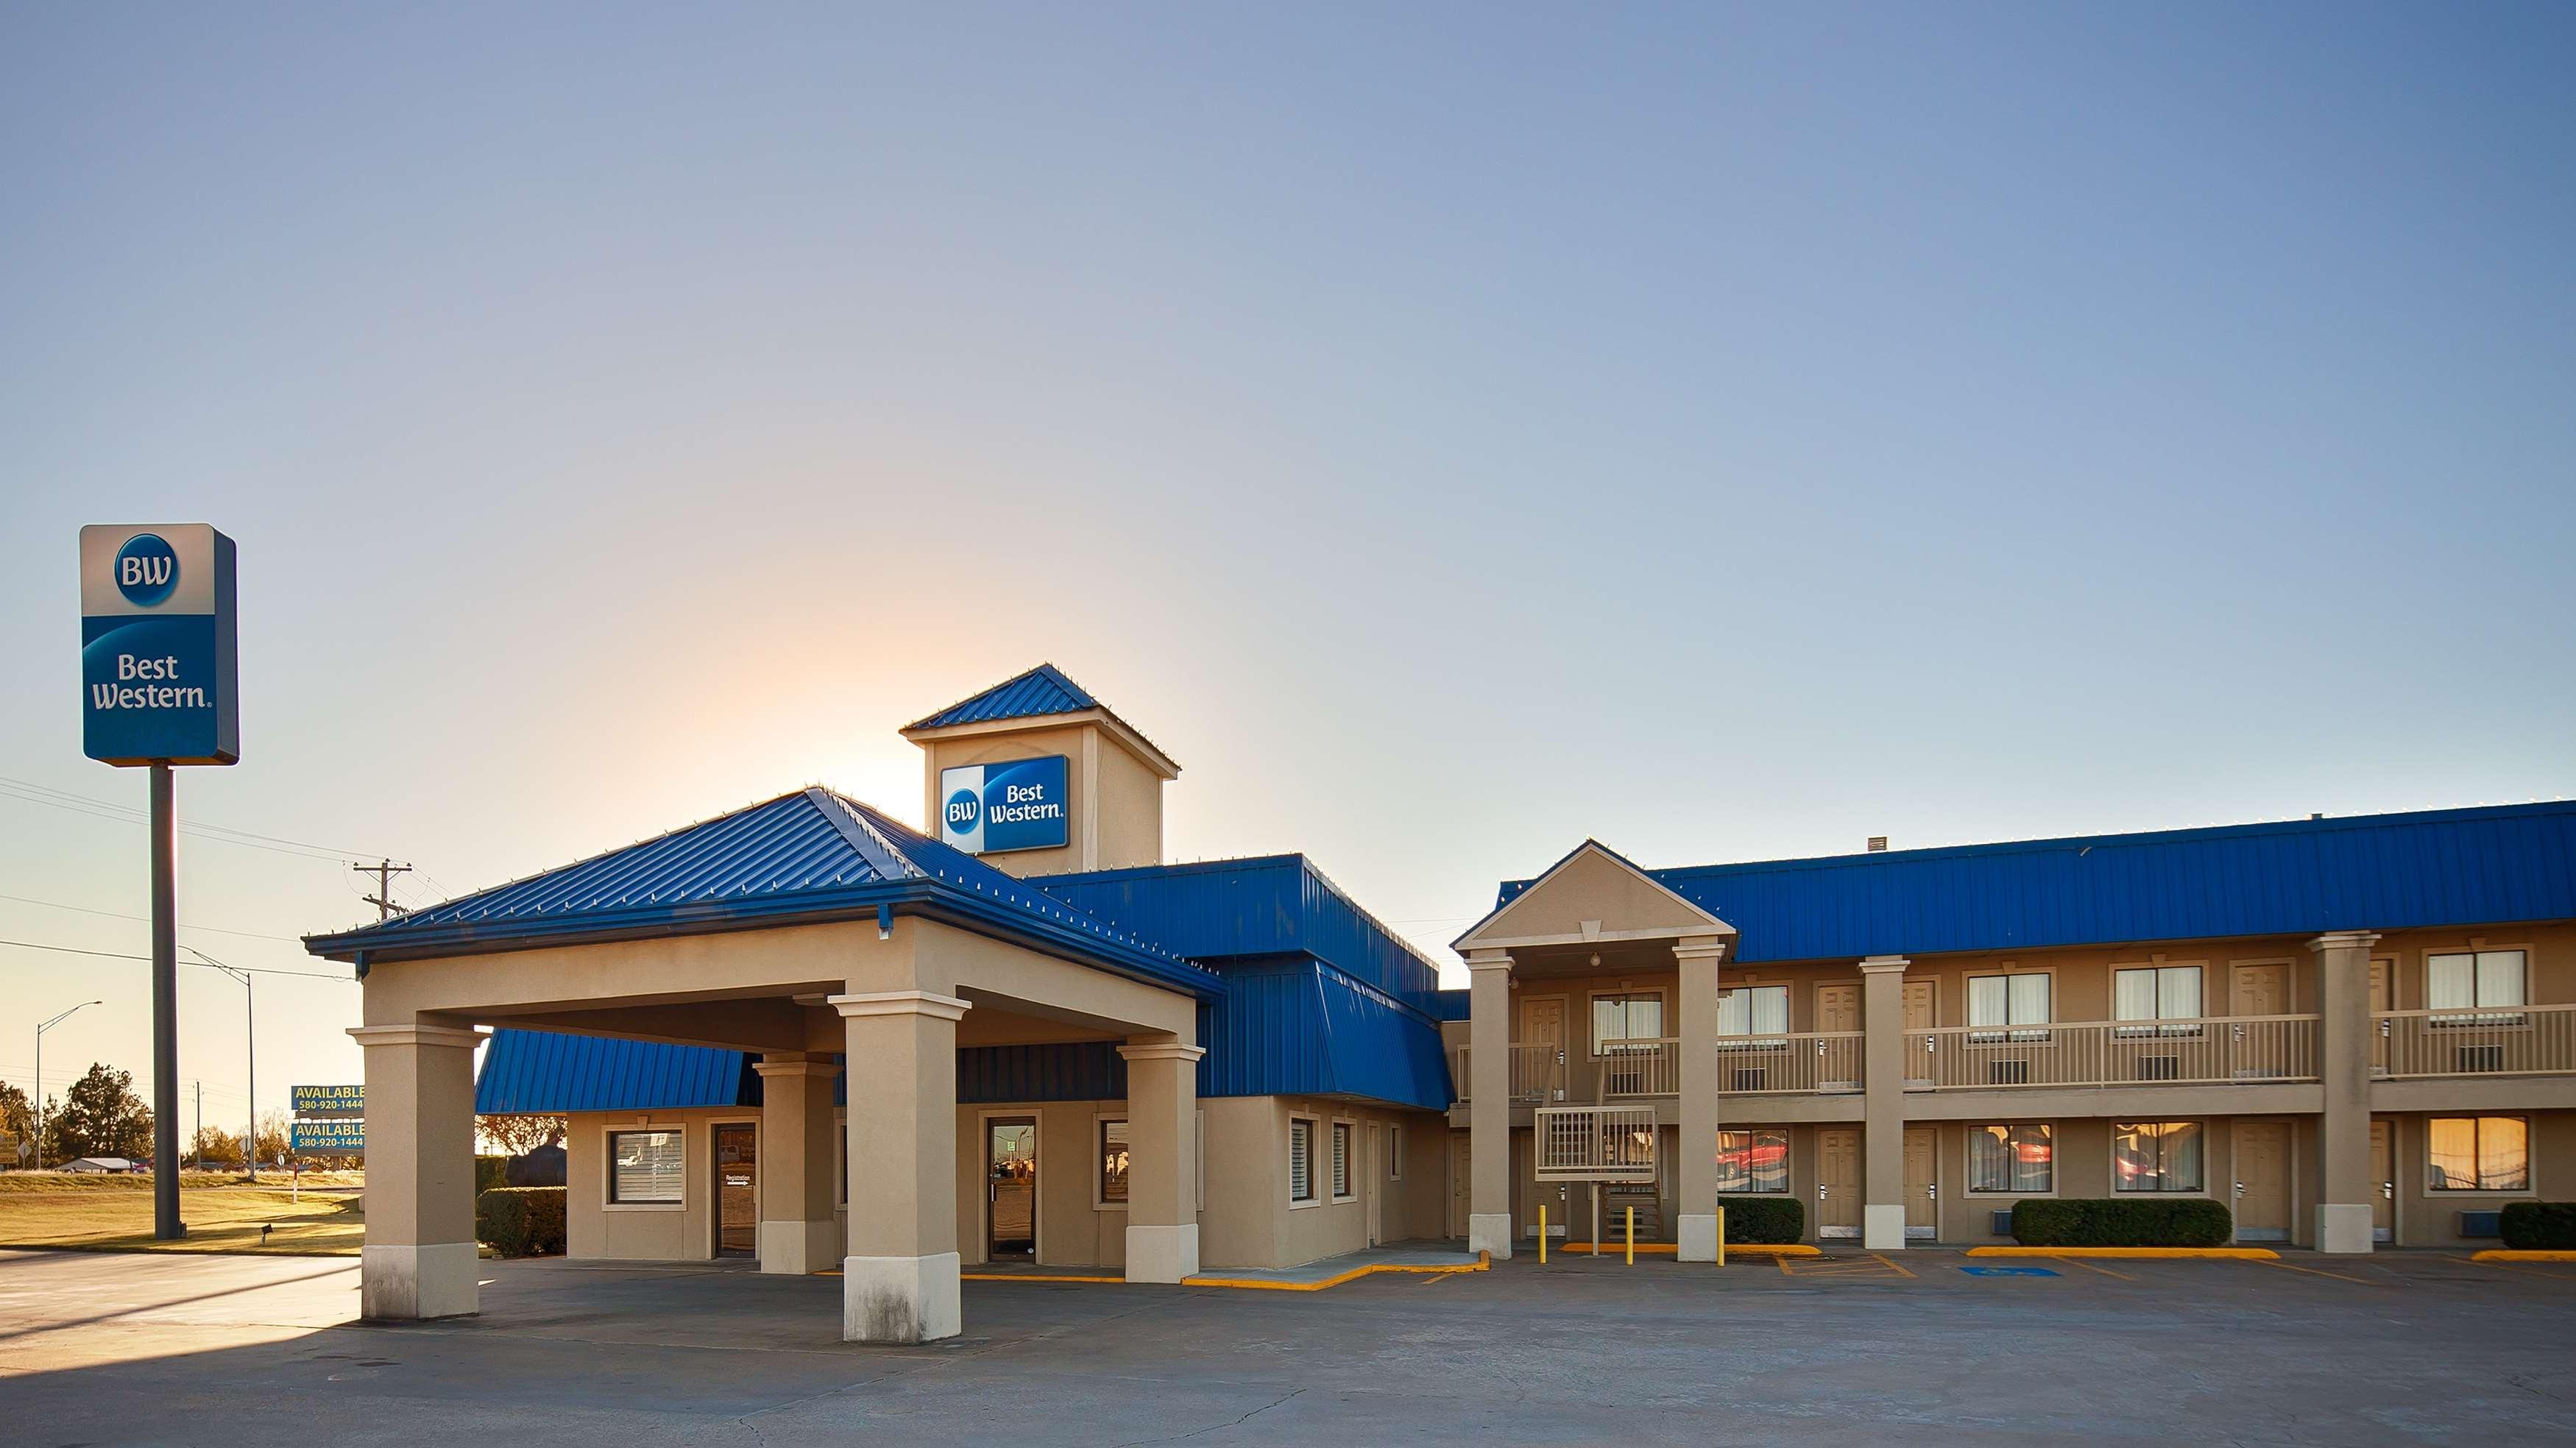 Best Western Inn of McAlester image 0